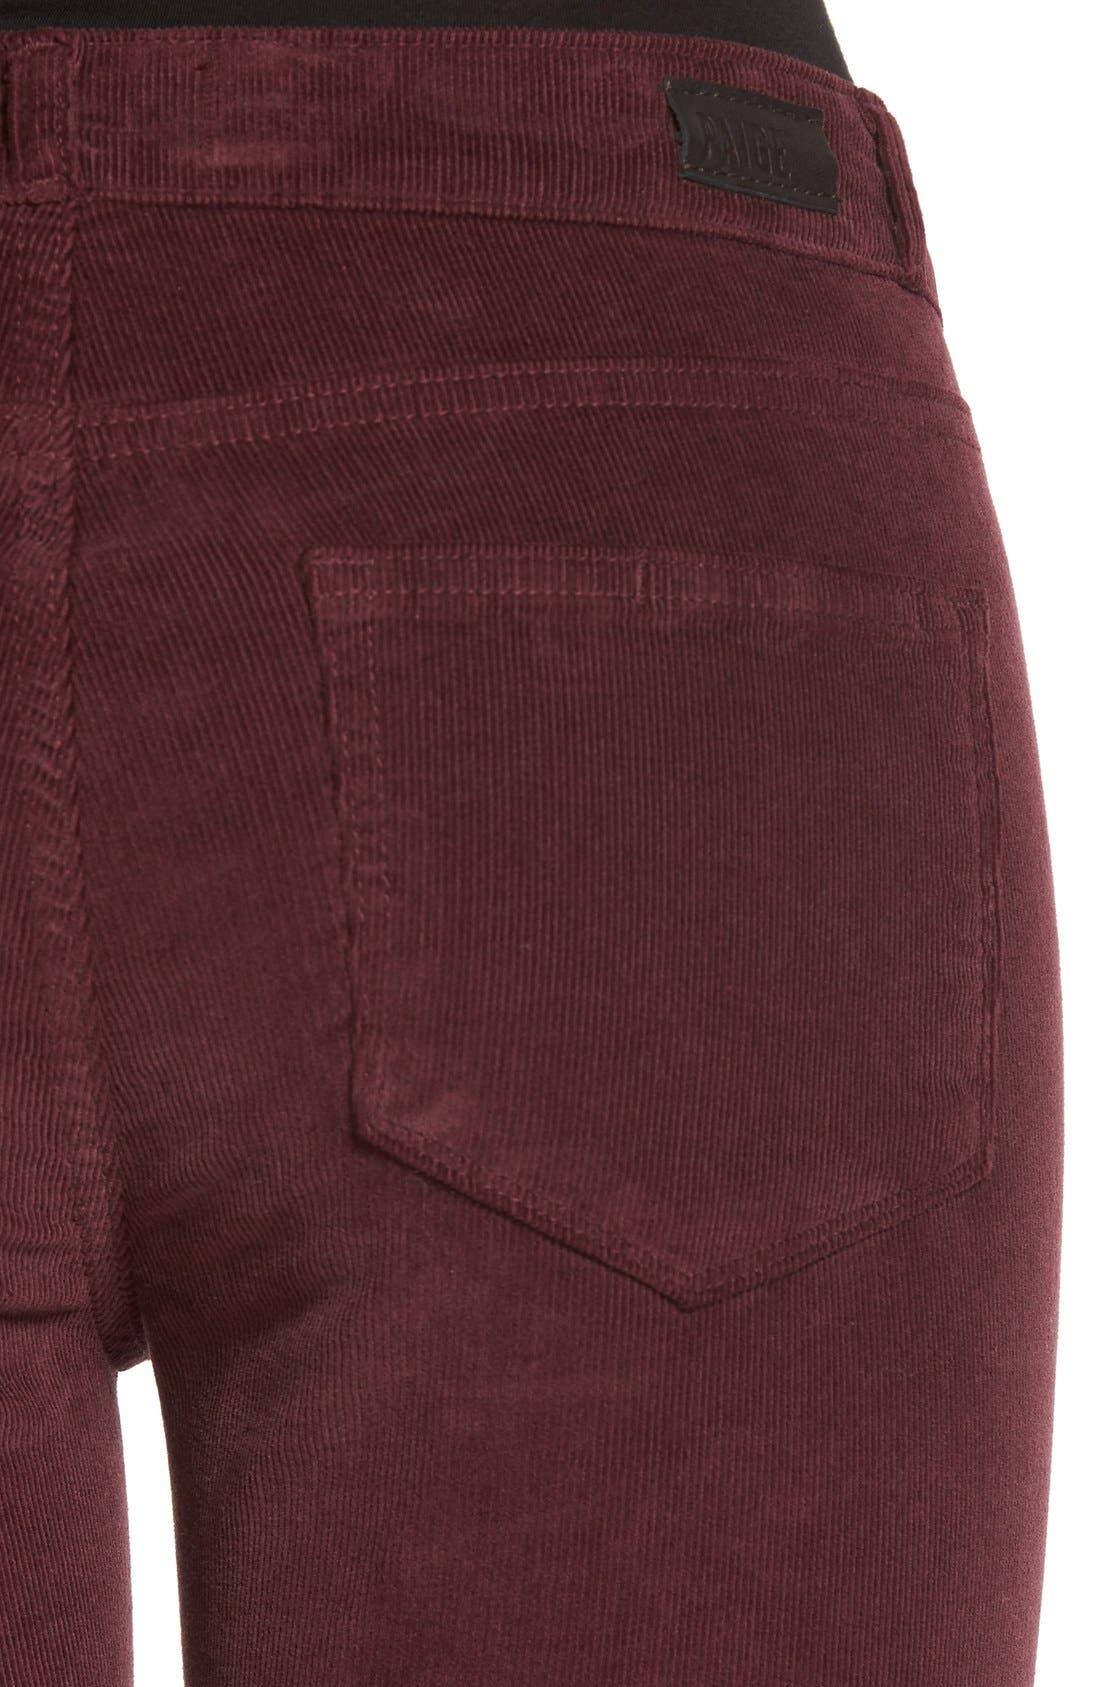 'Verdugo' Ankle Skinny Corduroy Pants,                             Alternate thumbnail 4, color,                             500